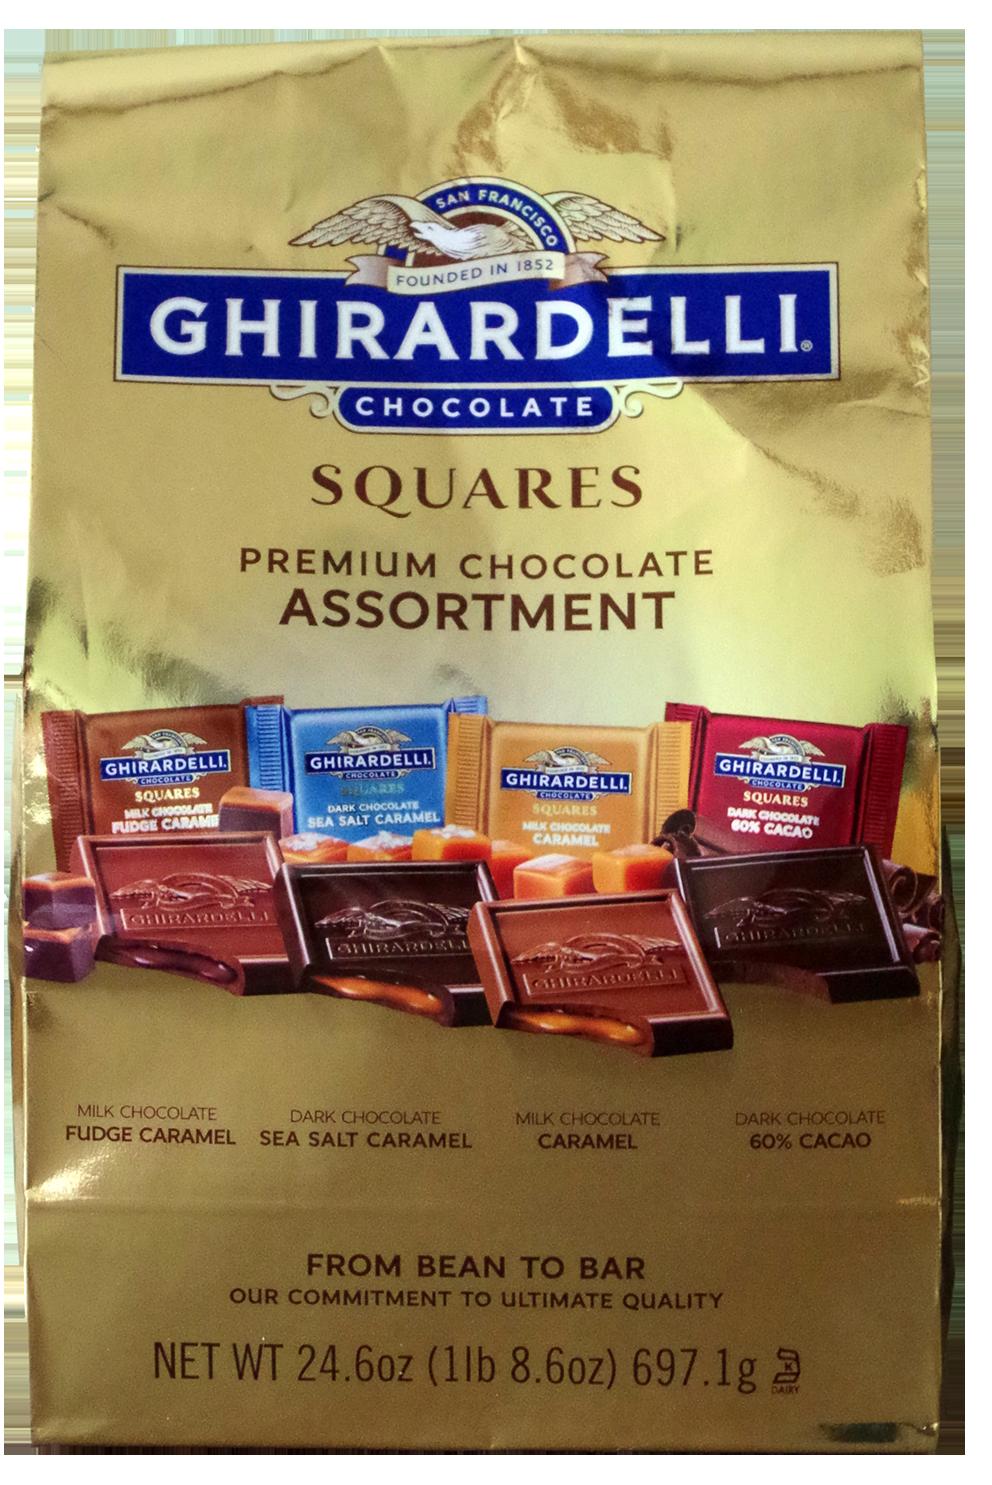 Ghirardelli chocolate squares assortment - 24.6 oz